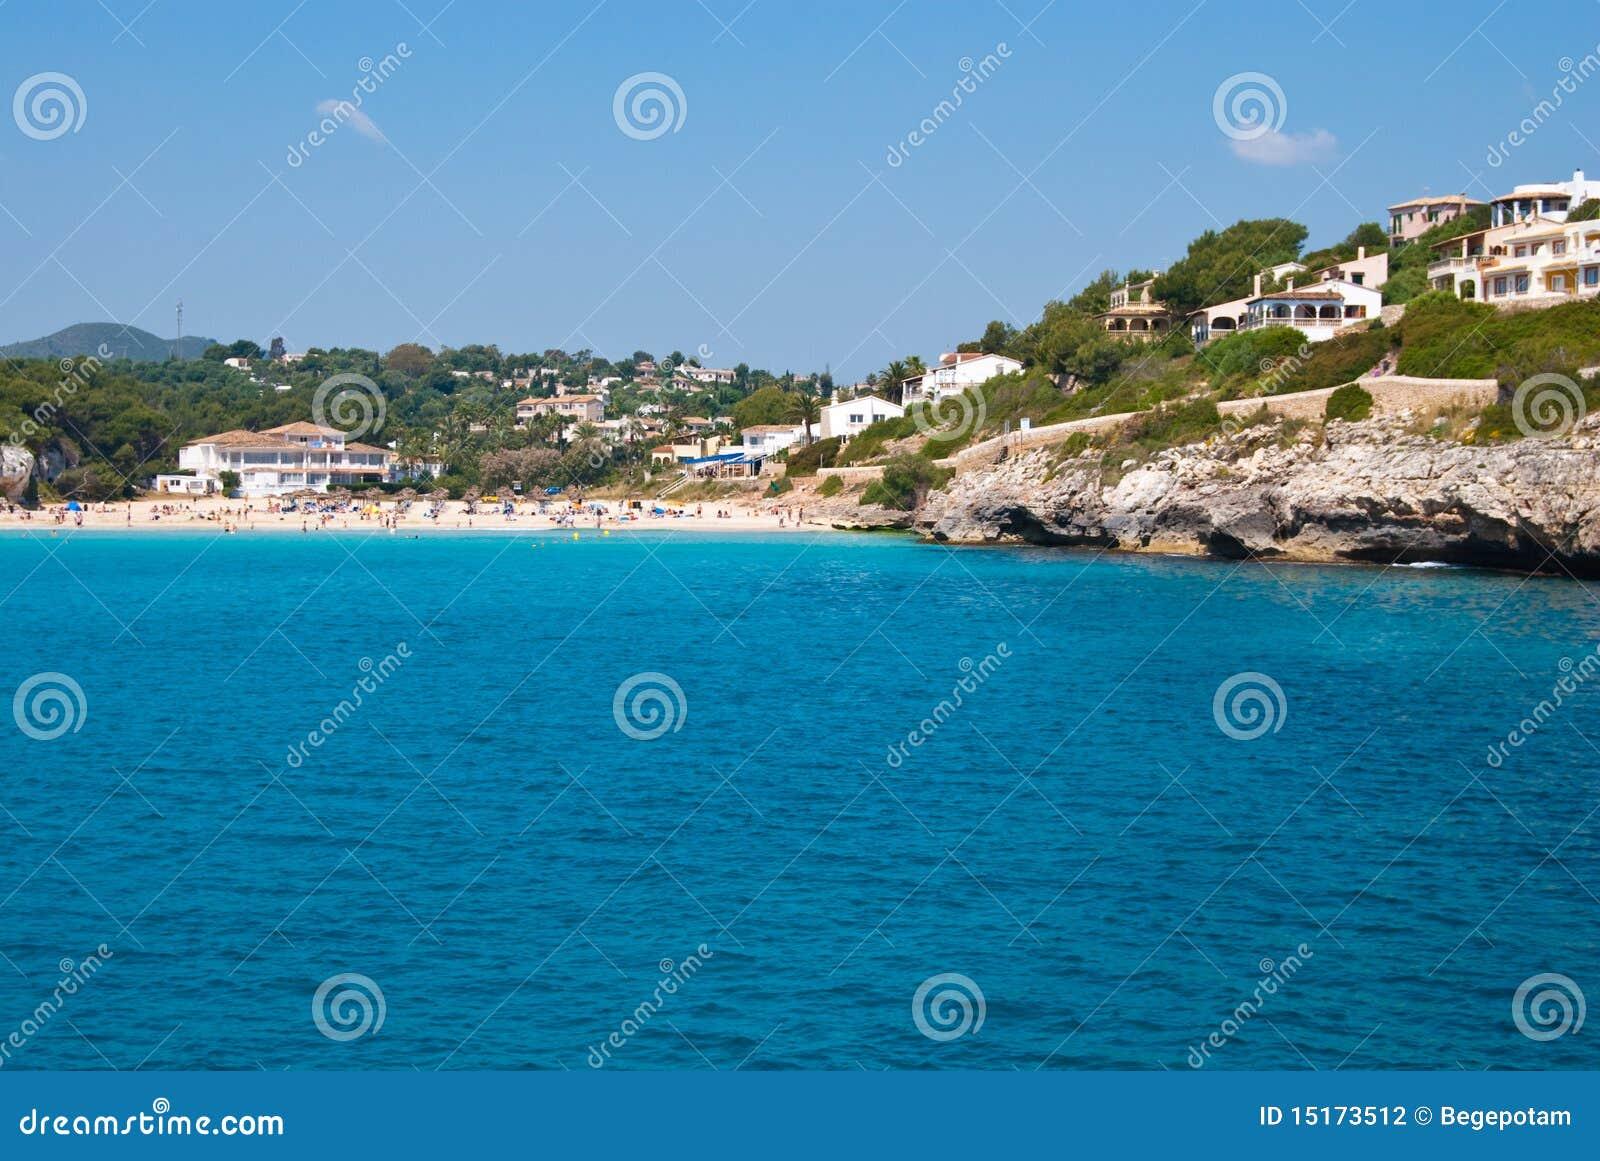 Cala Romantica Spain  city pictures gallery : Cala Romantica Beach And Hotels, Majorca, Spain Stock Photography ...